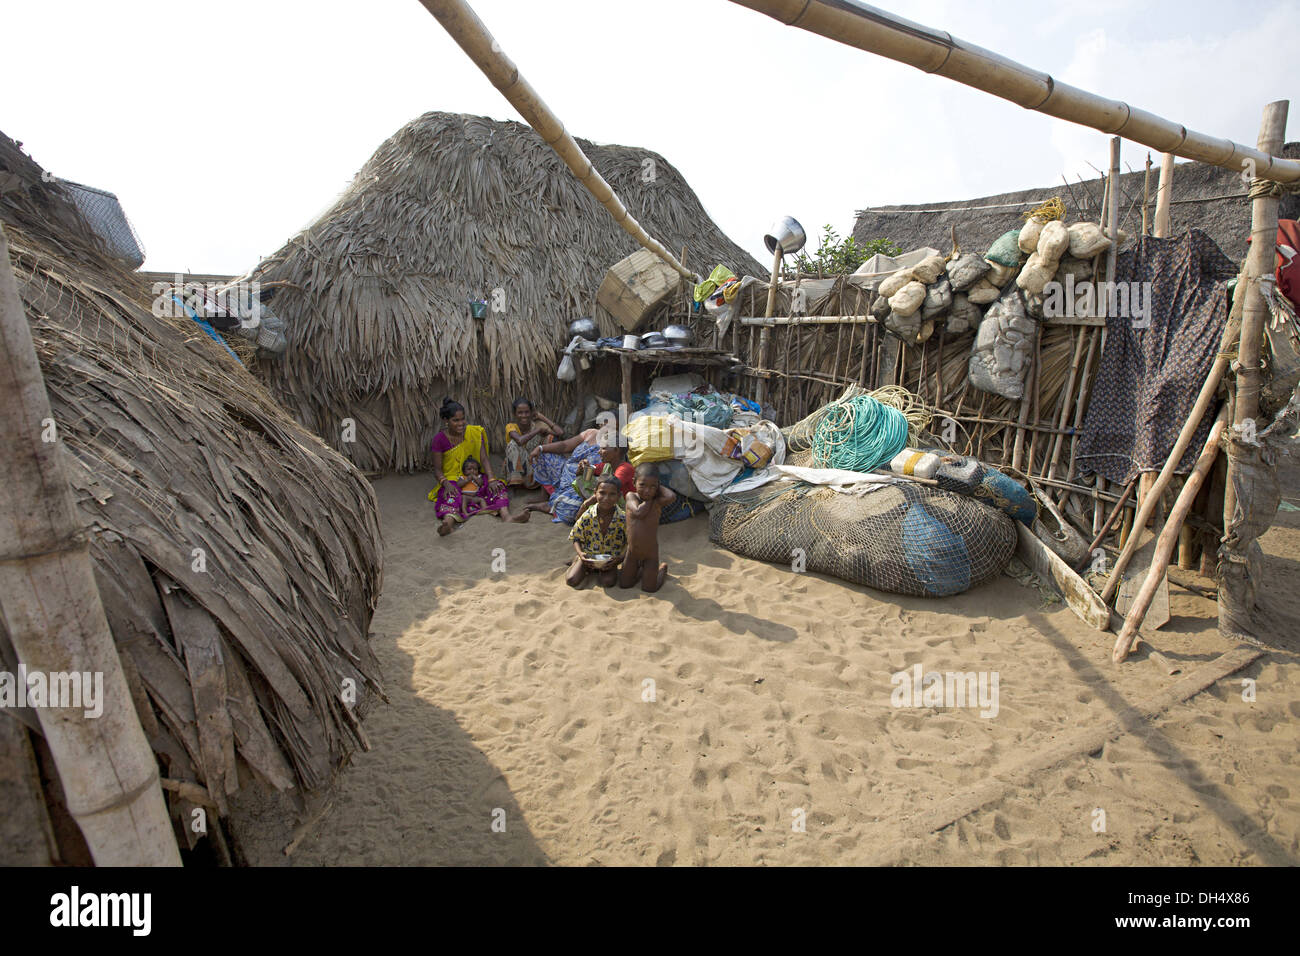 Tribal houses, fisherman village near Puri, Orissa, India - Stock Image